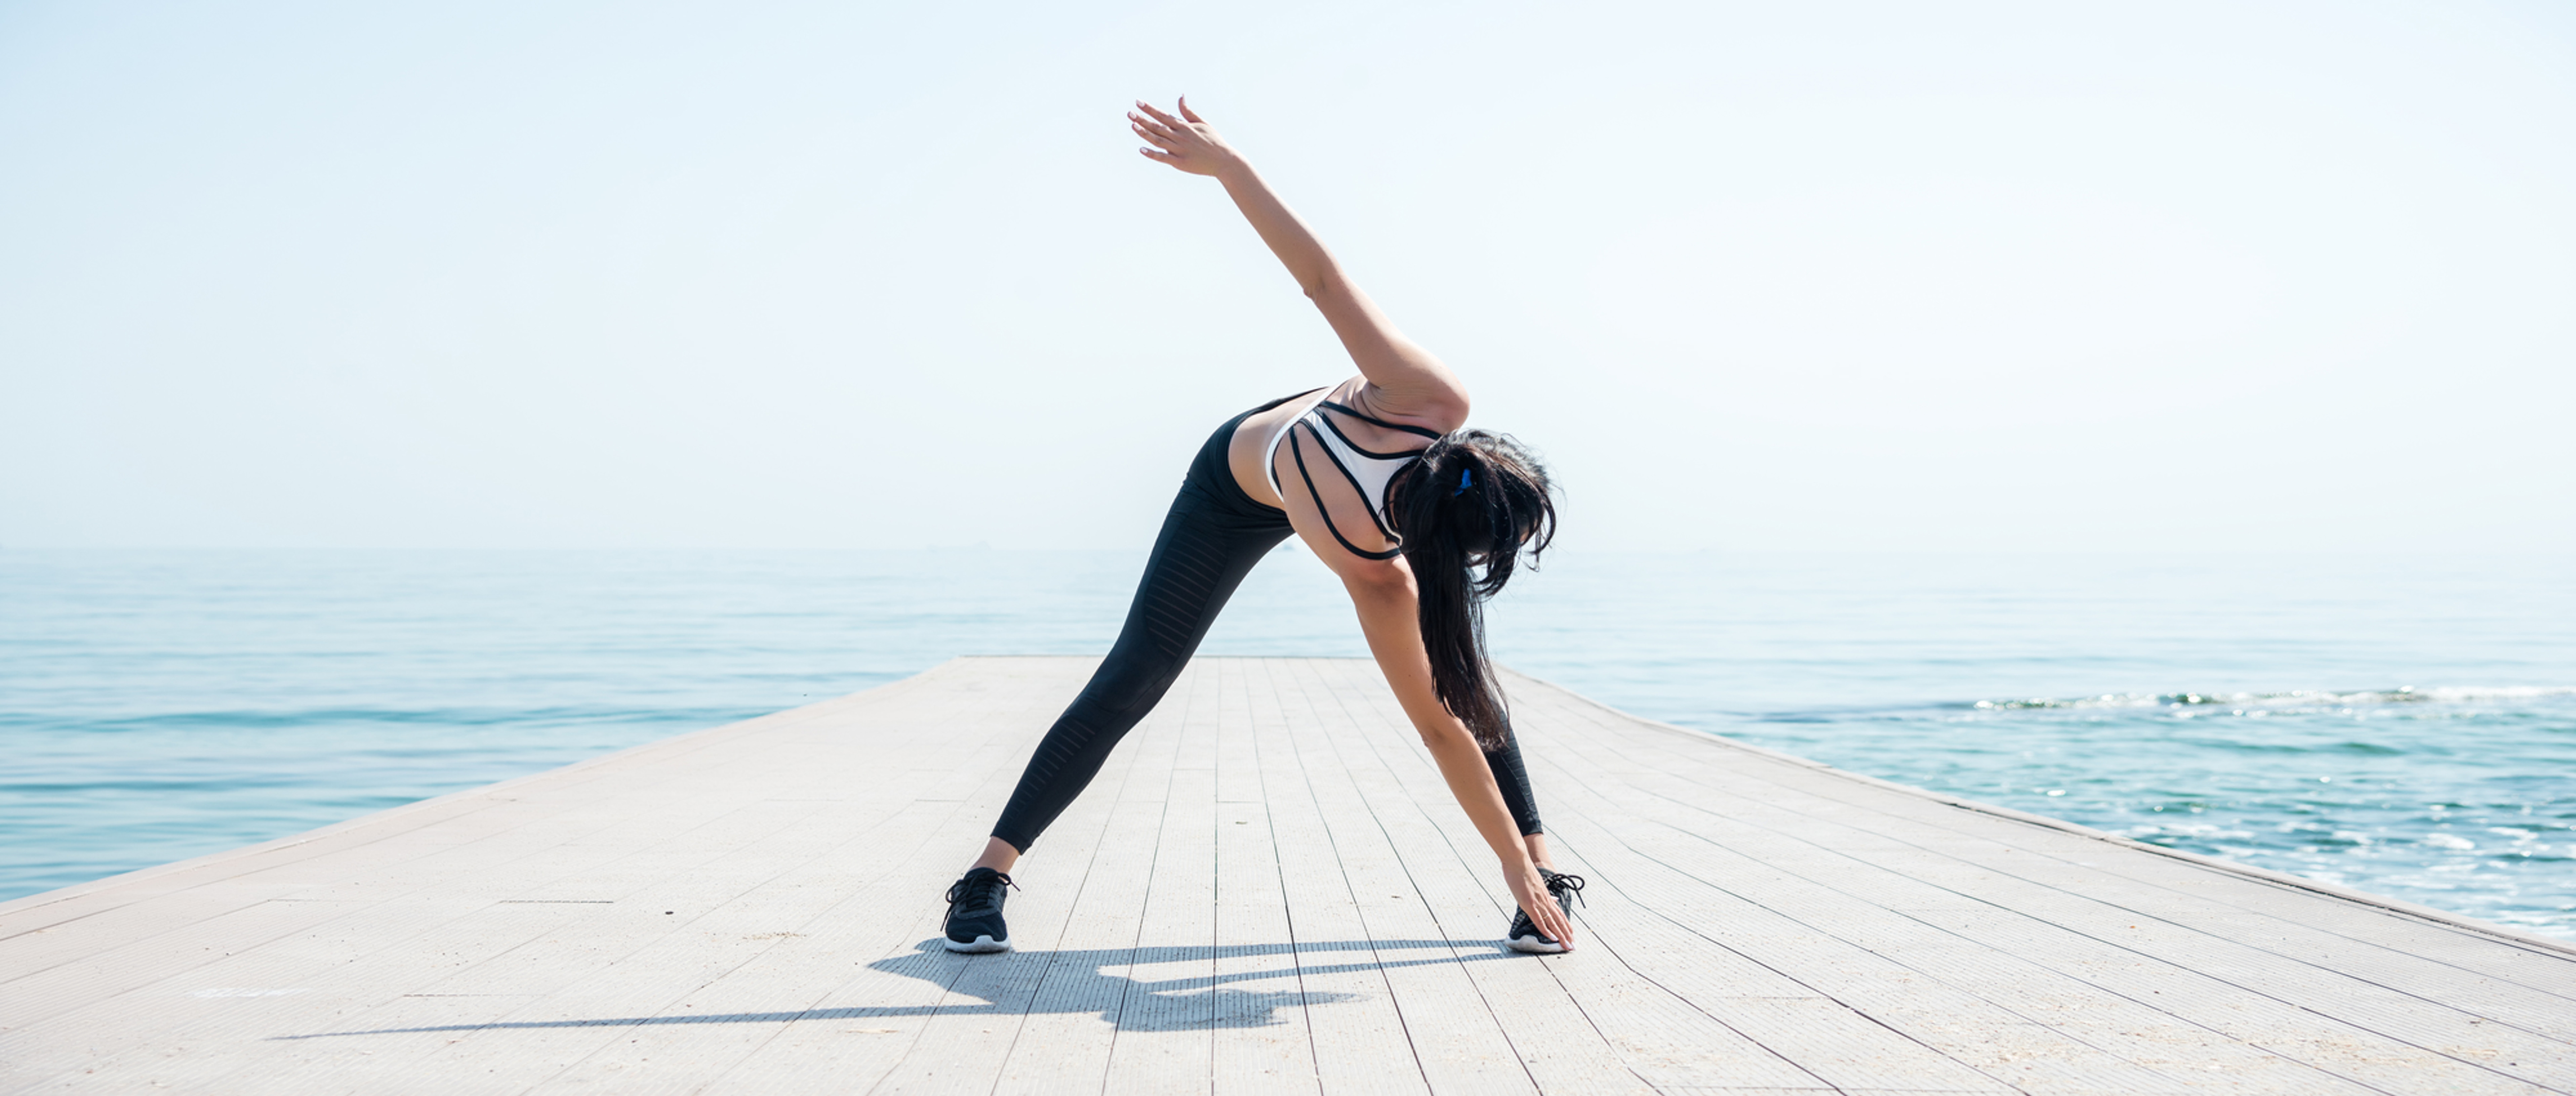 Health, Wellness and Fitness Topics